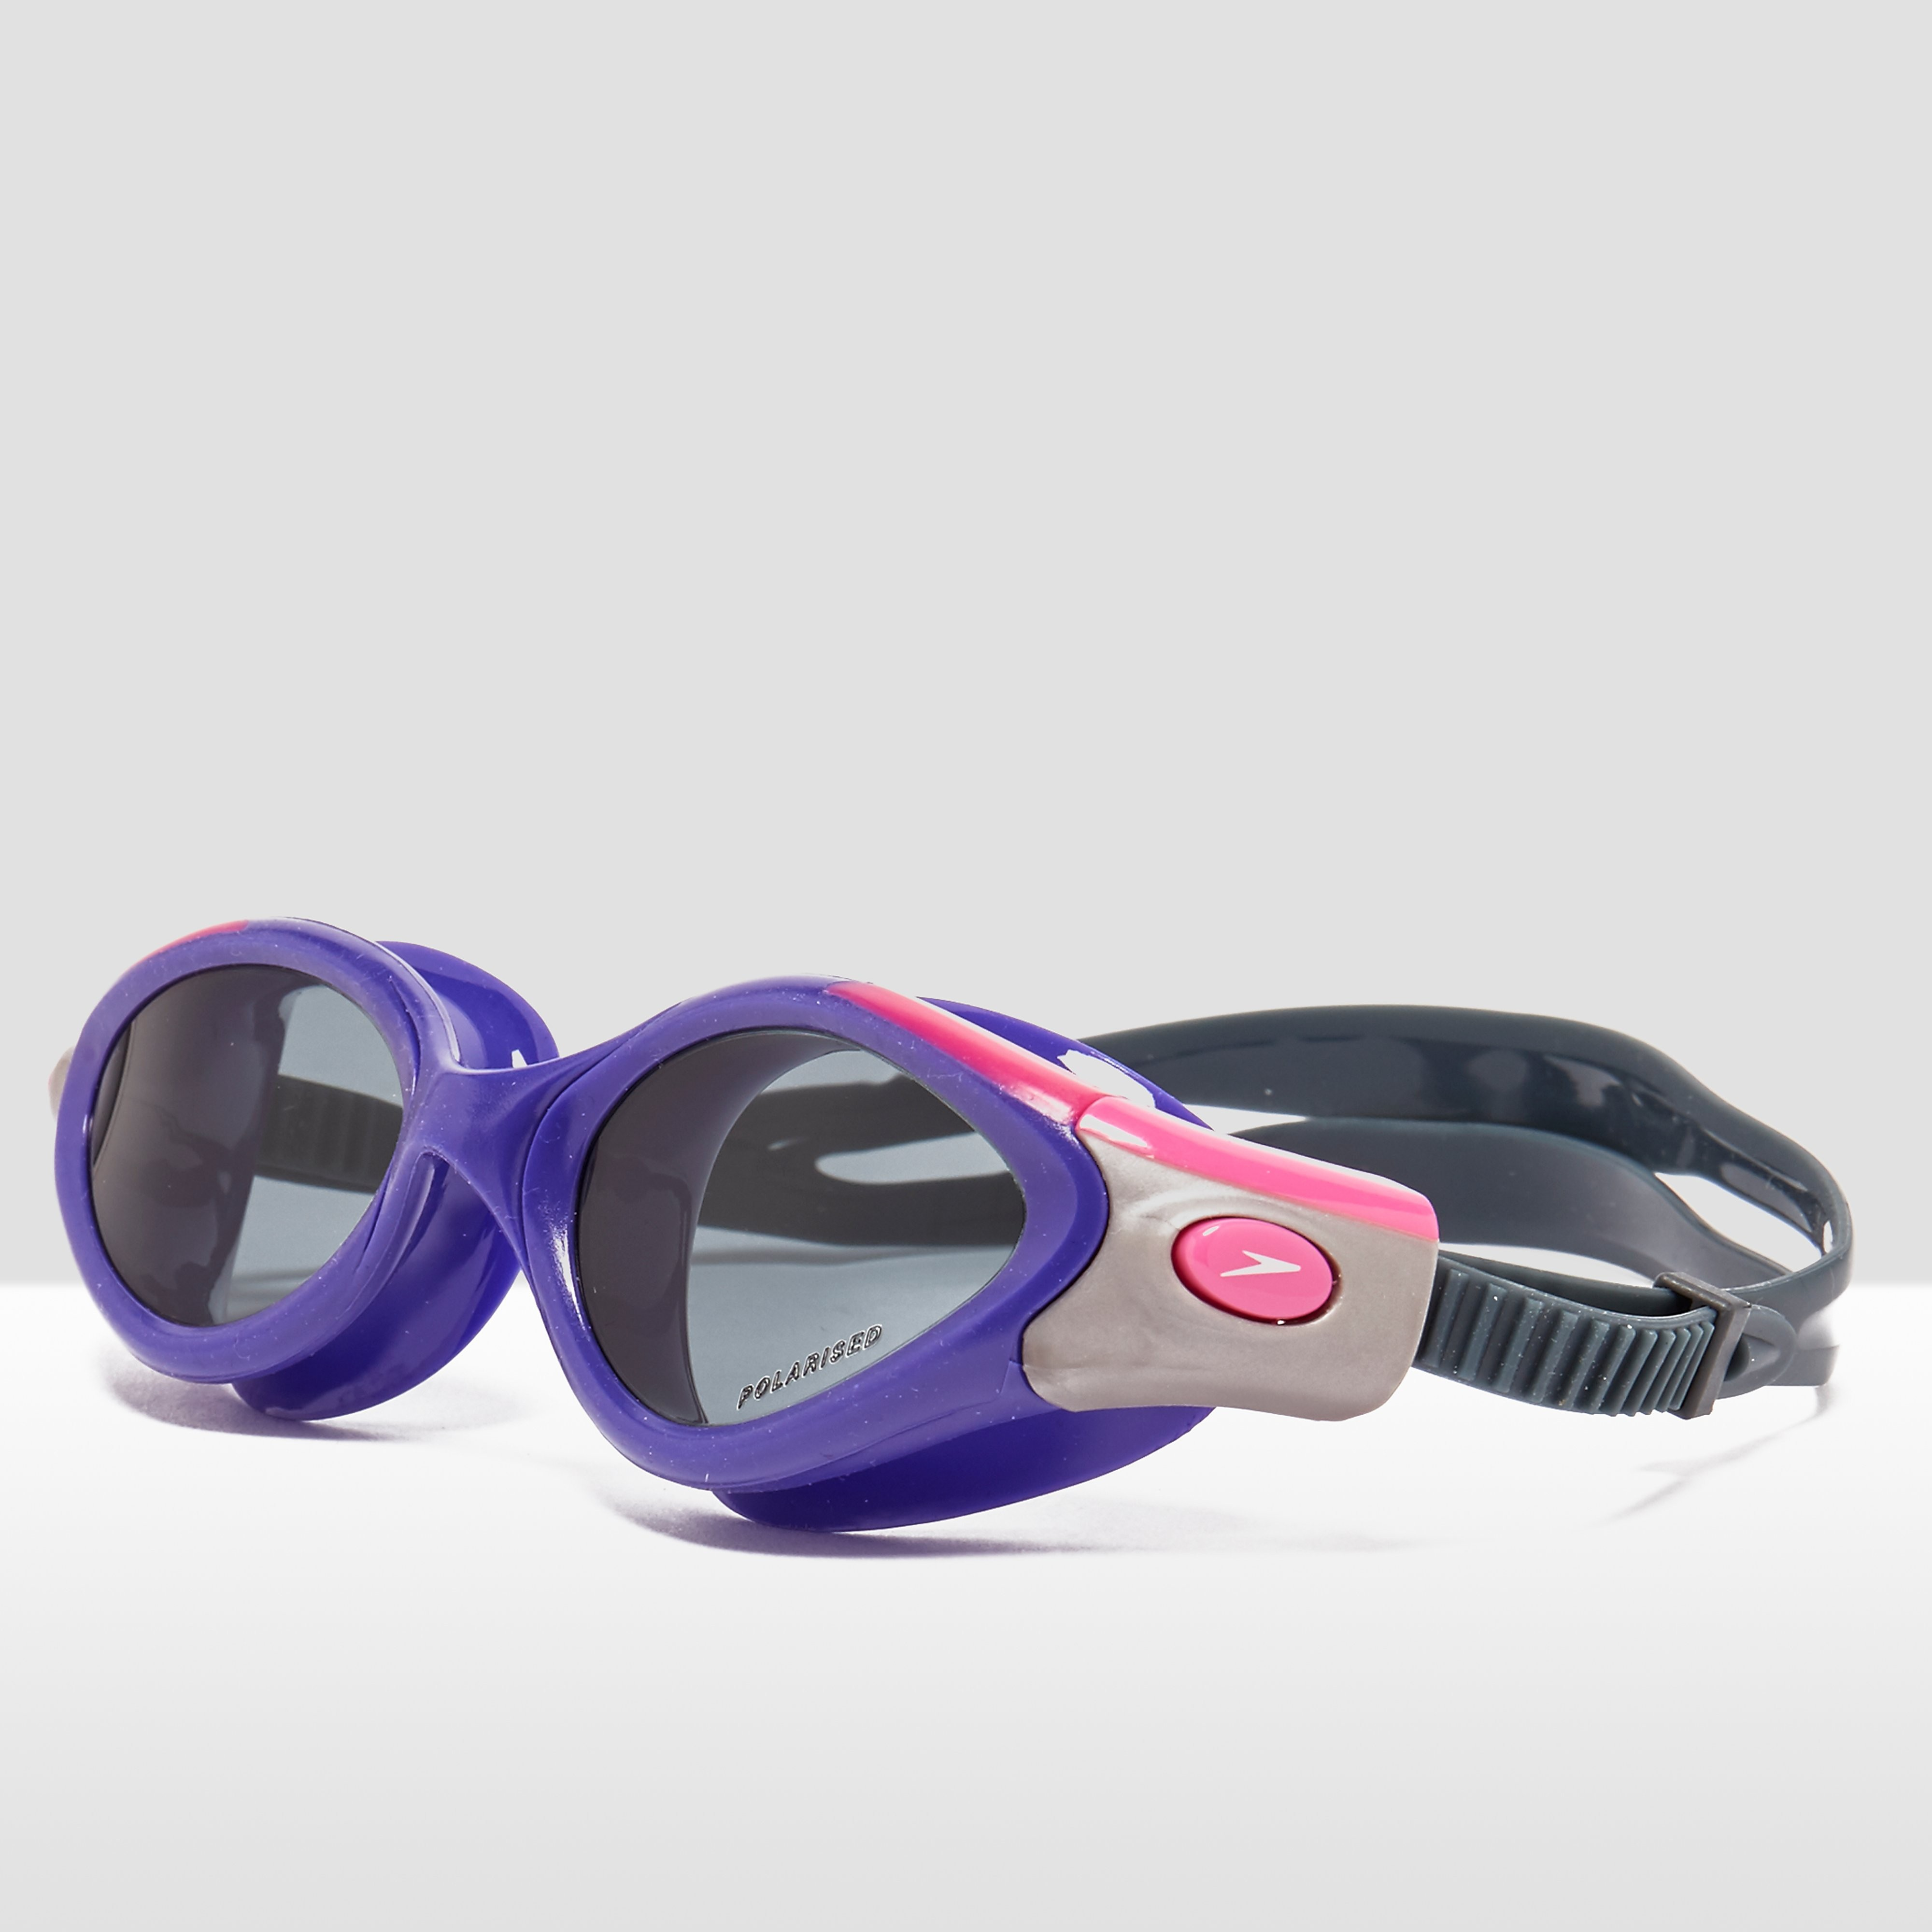 Speedo Women's Futura Biofuse 2 Polarised Swimming Goggles